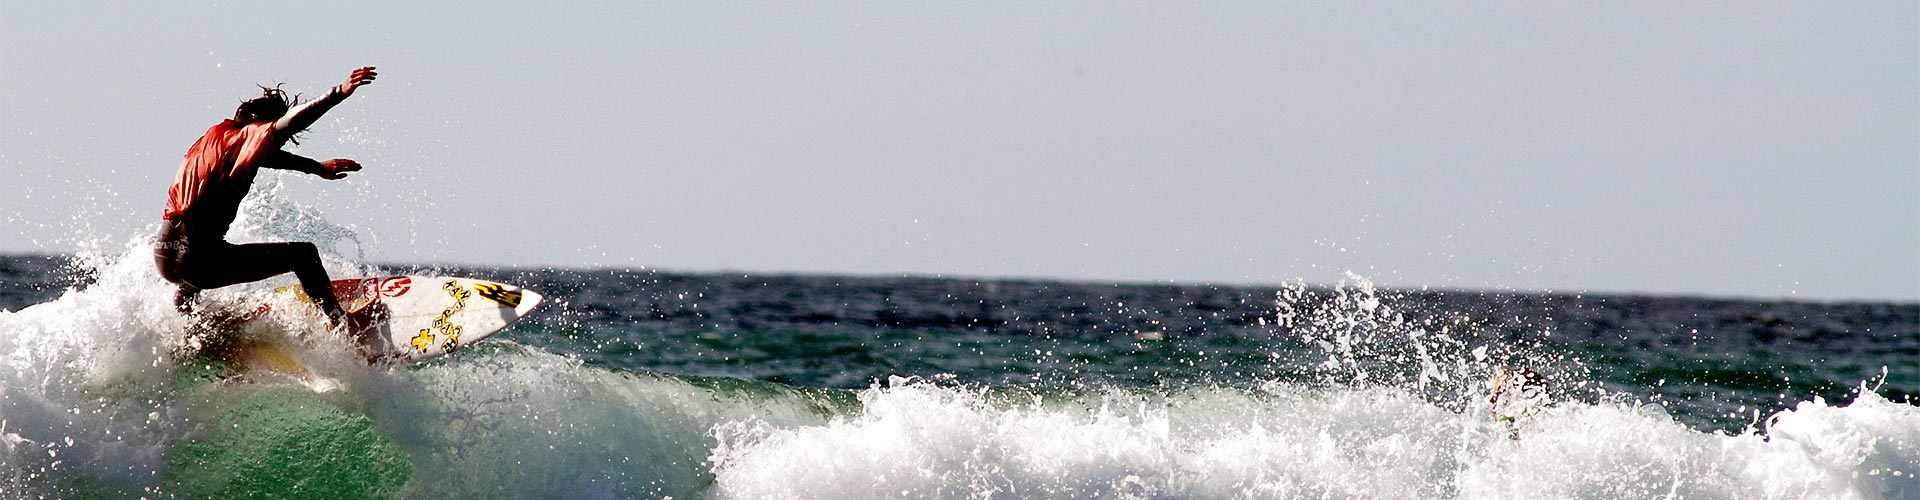 surf en centrosdeportes de Florida